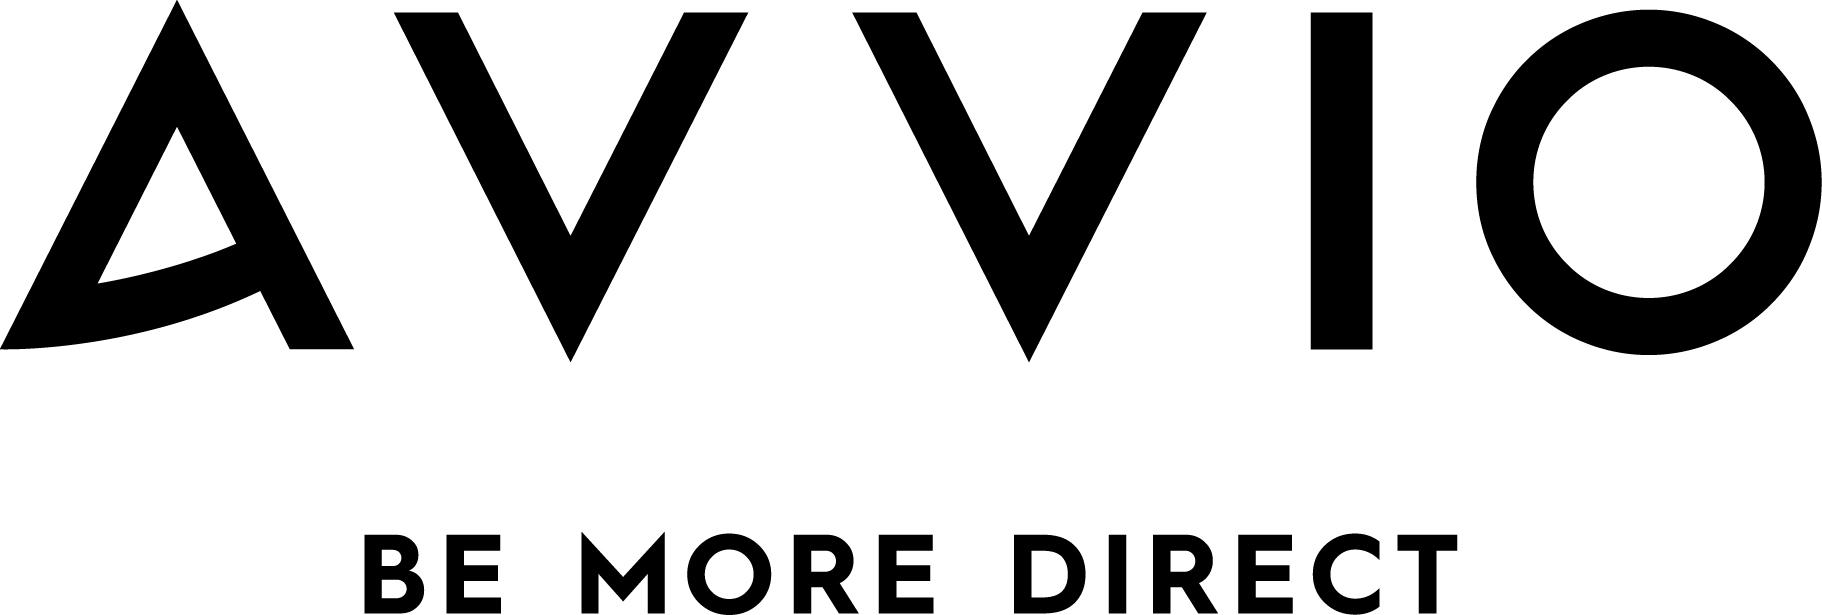 OrangeHRM Partners - Avvivo